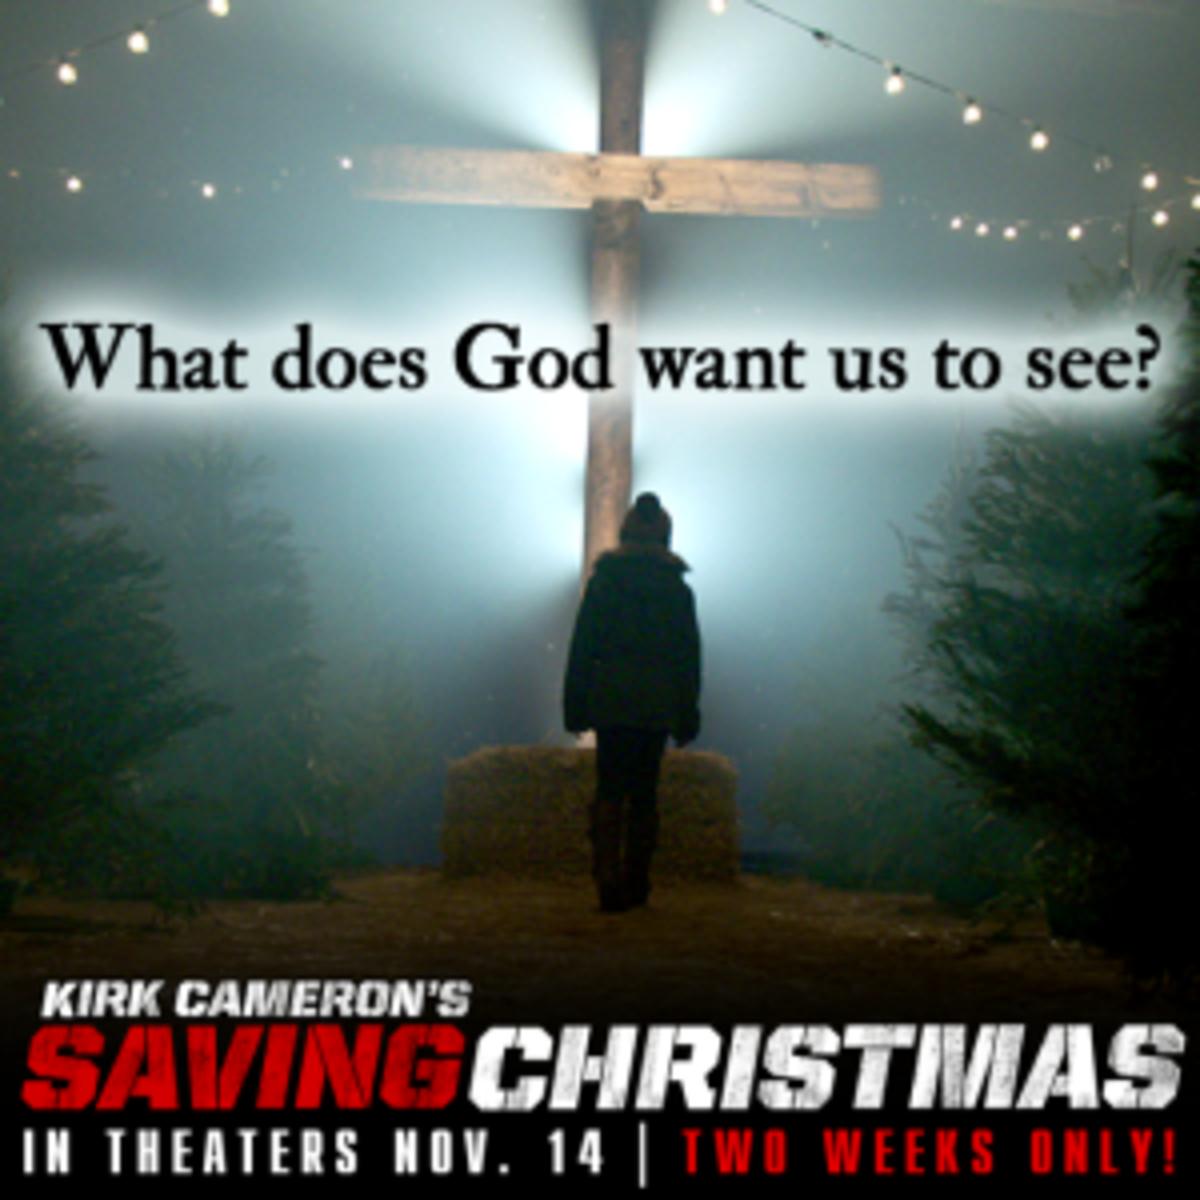 Saving Christmas From Kirk Cameron | Psychology Today